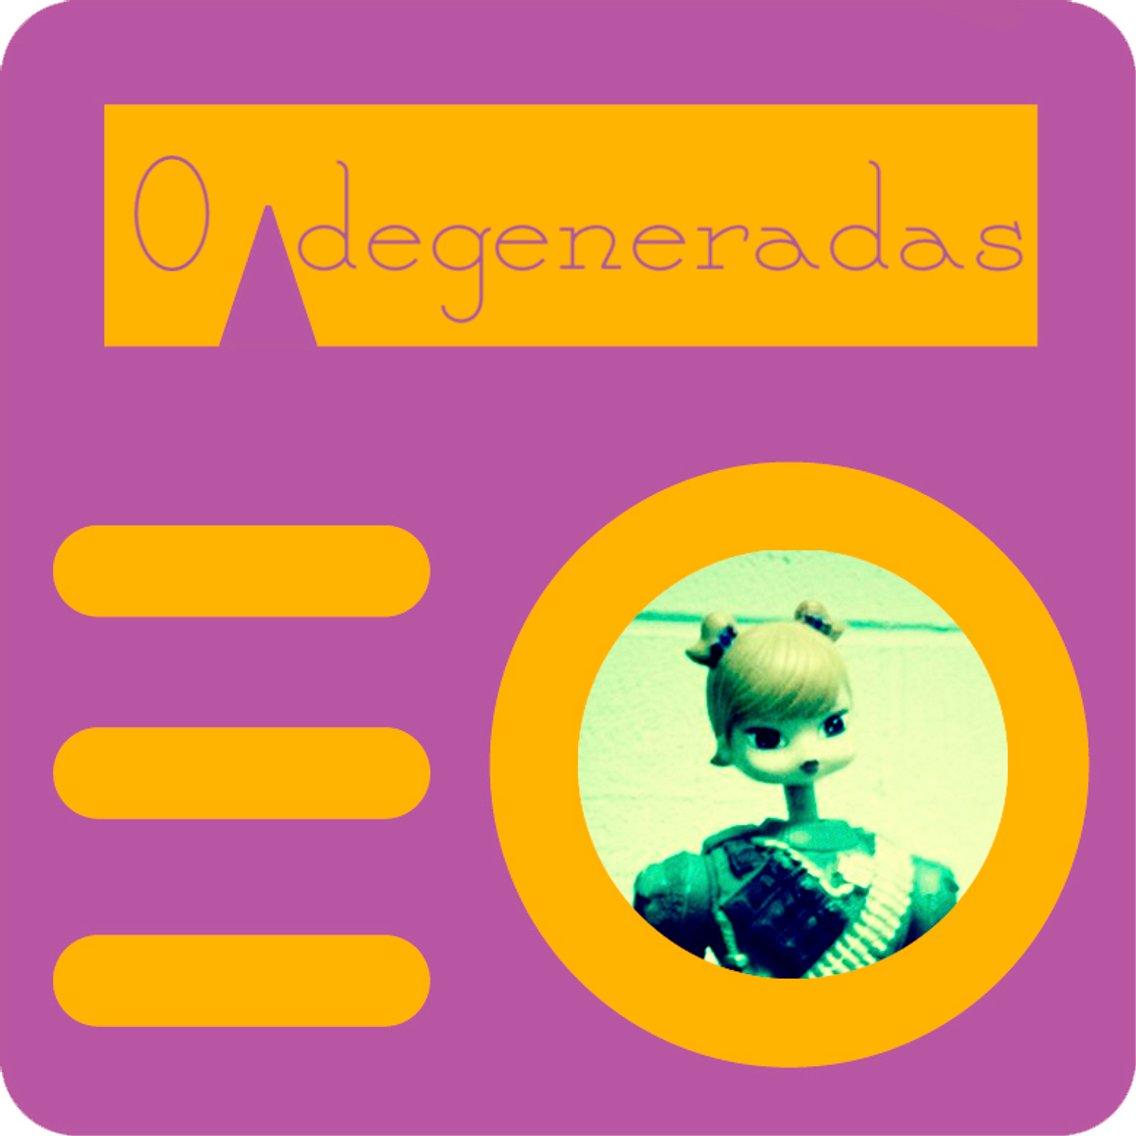 Degeneradas - Cover Image